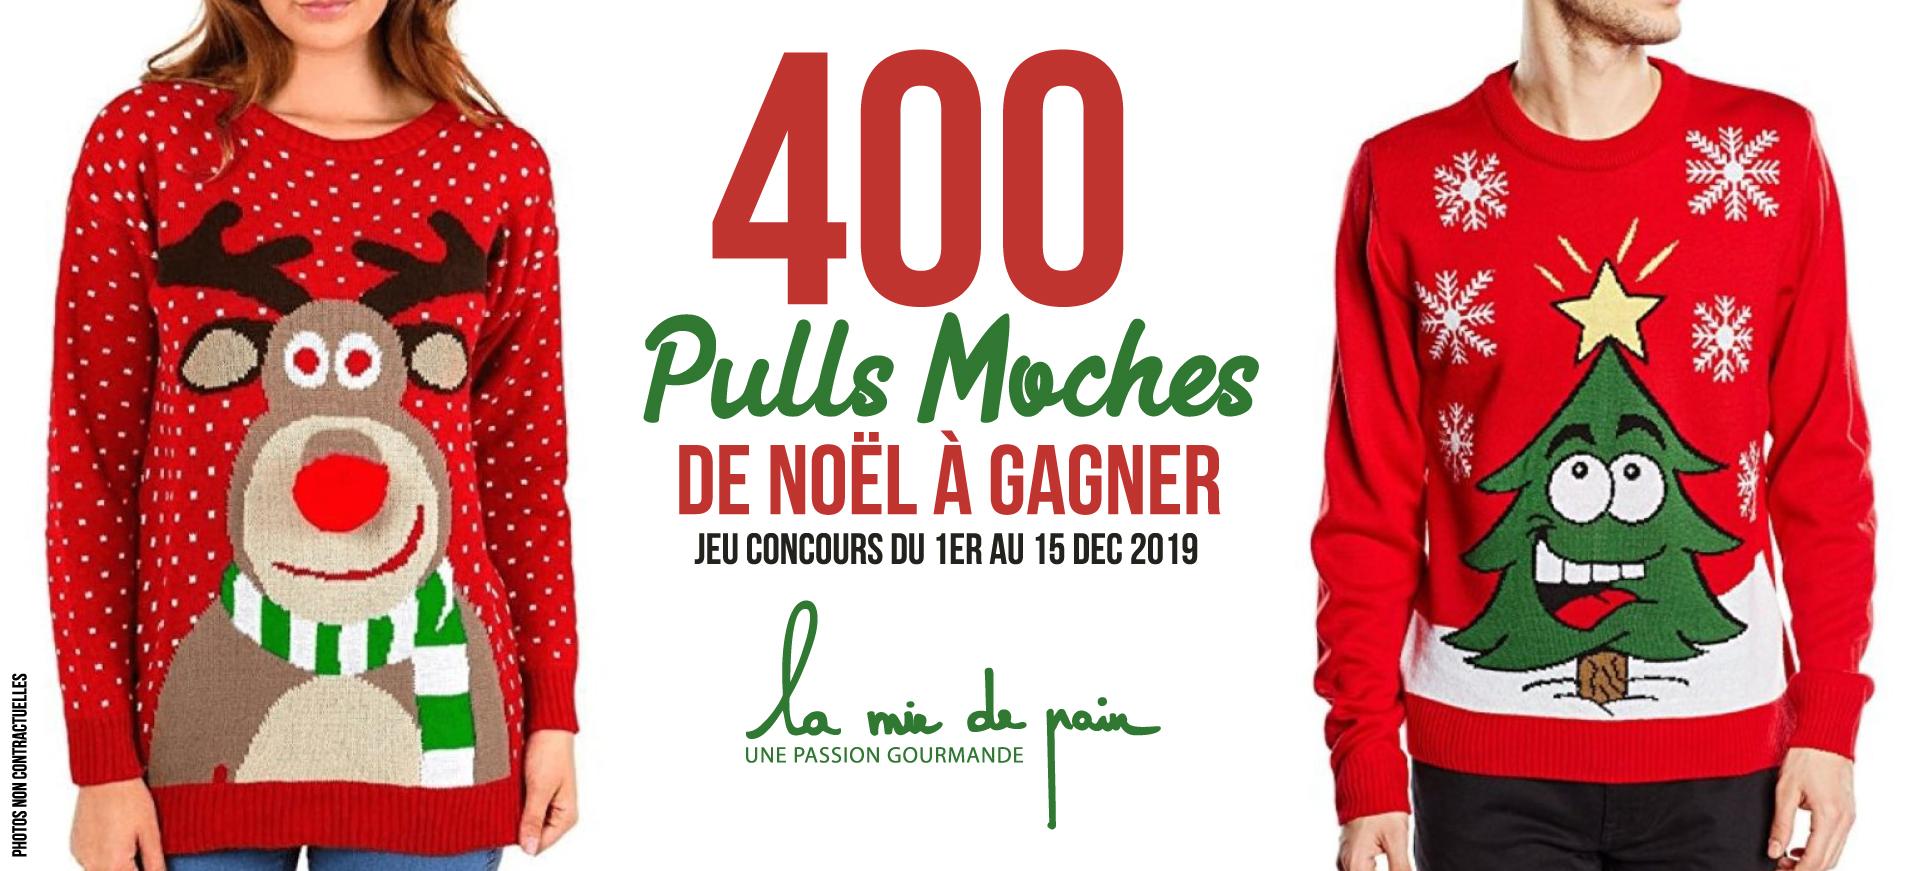 pullsmochesdenoel-lamiedepain-jeu-concours-boulangerie-2019-1920x871px